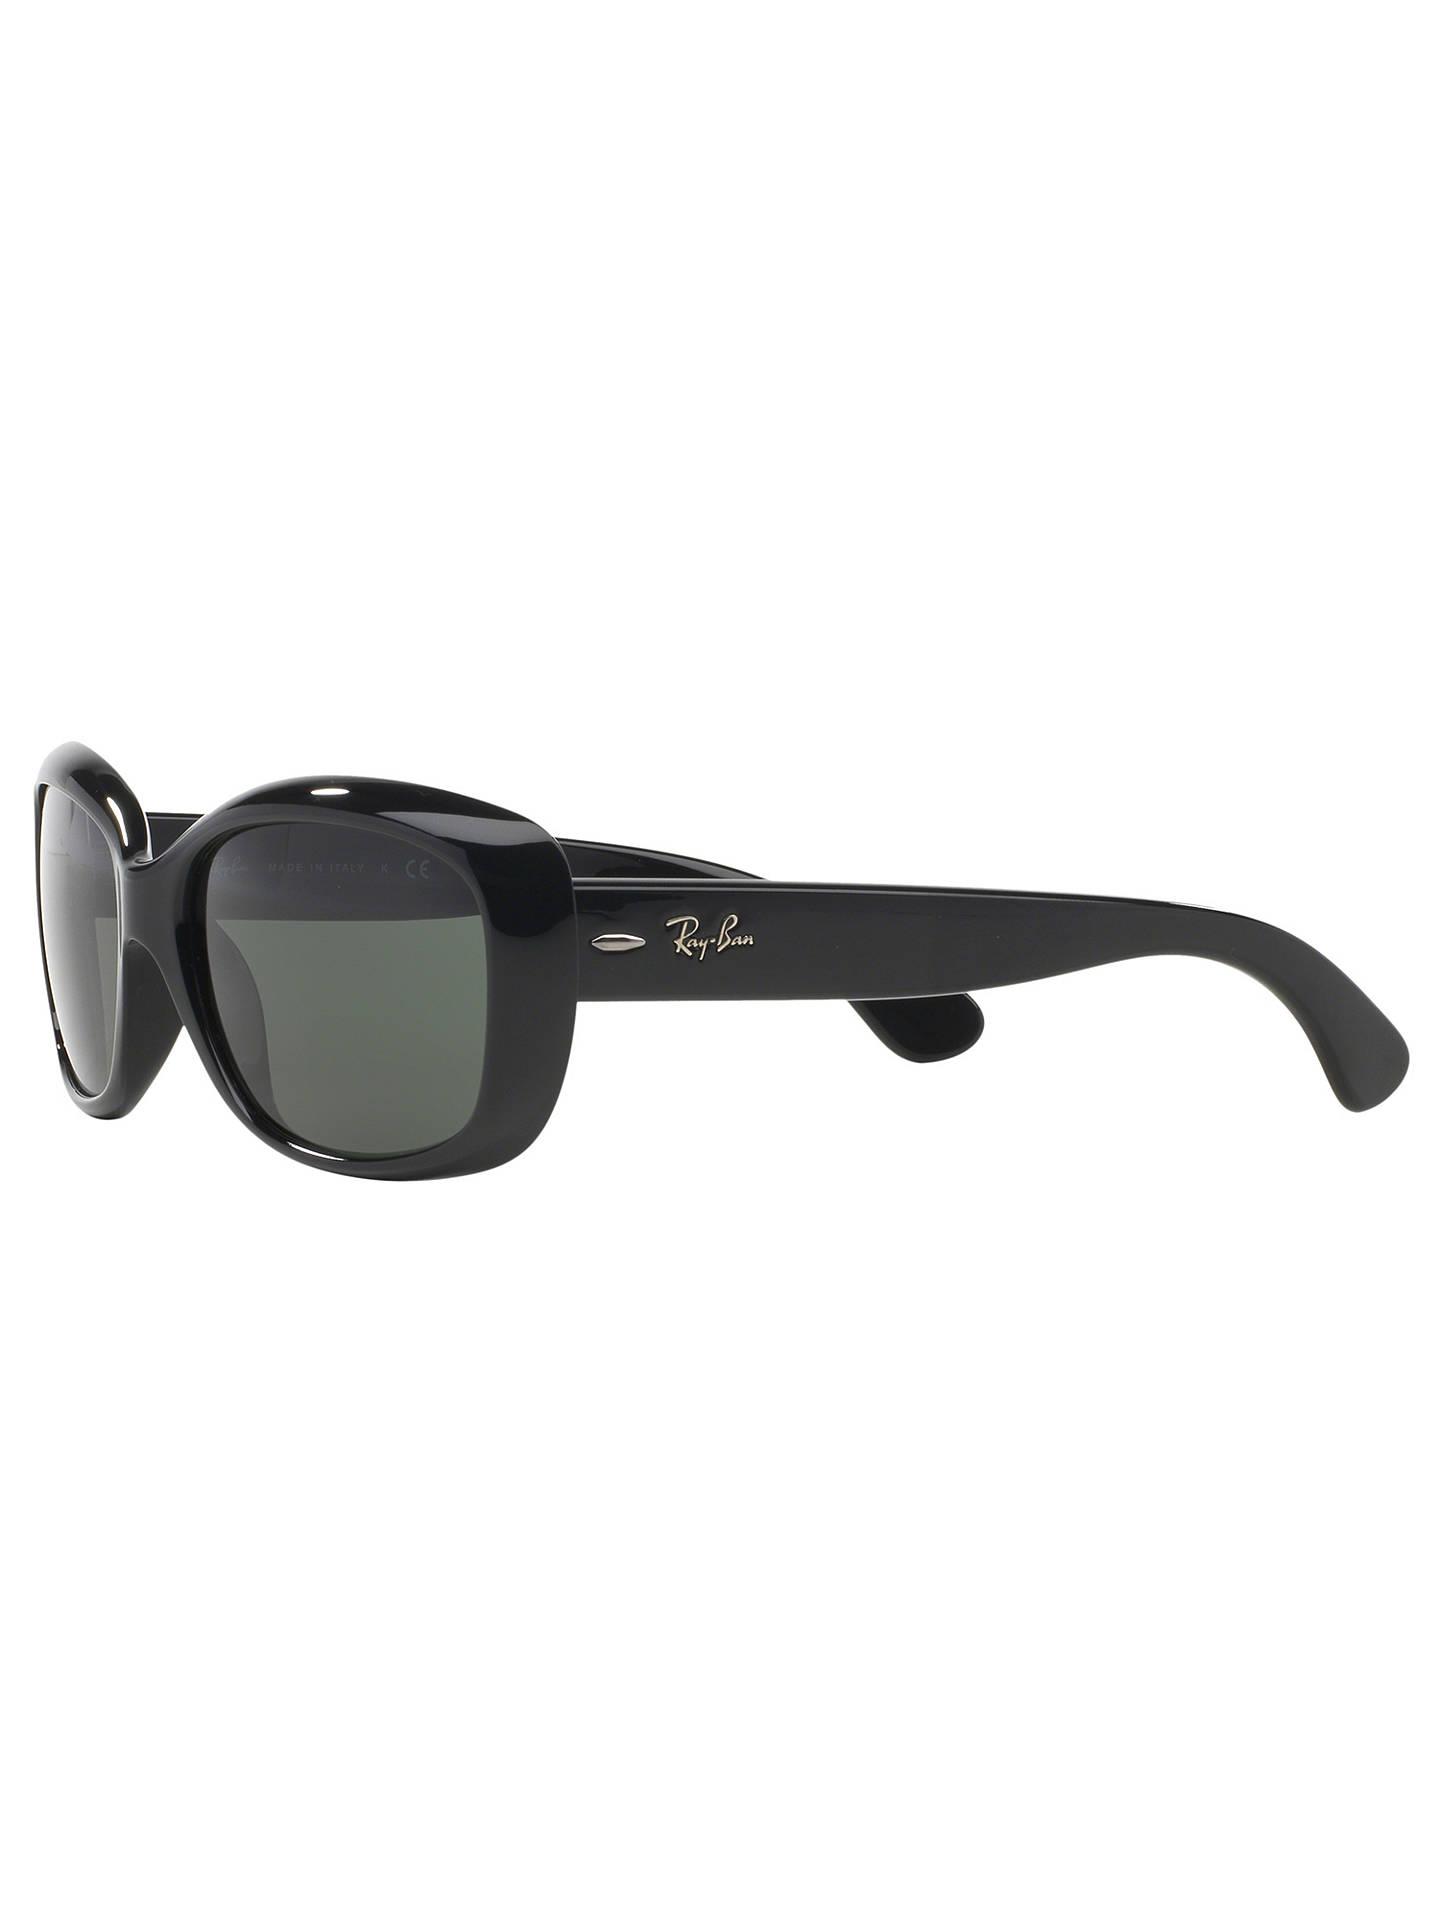 bdd19027e6 Ray-Ban RB4101 Women s Jackie Ohh Rectangular Sunglasses at John ...